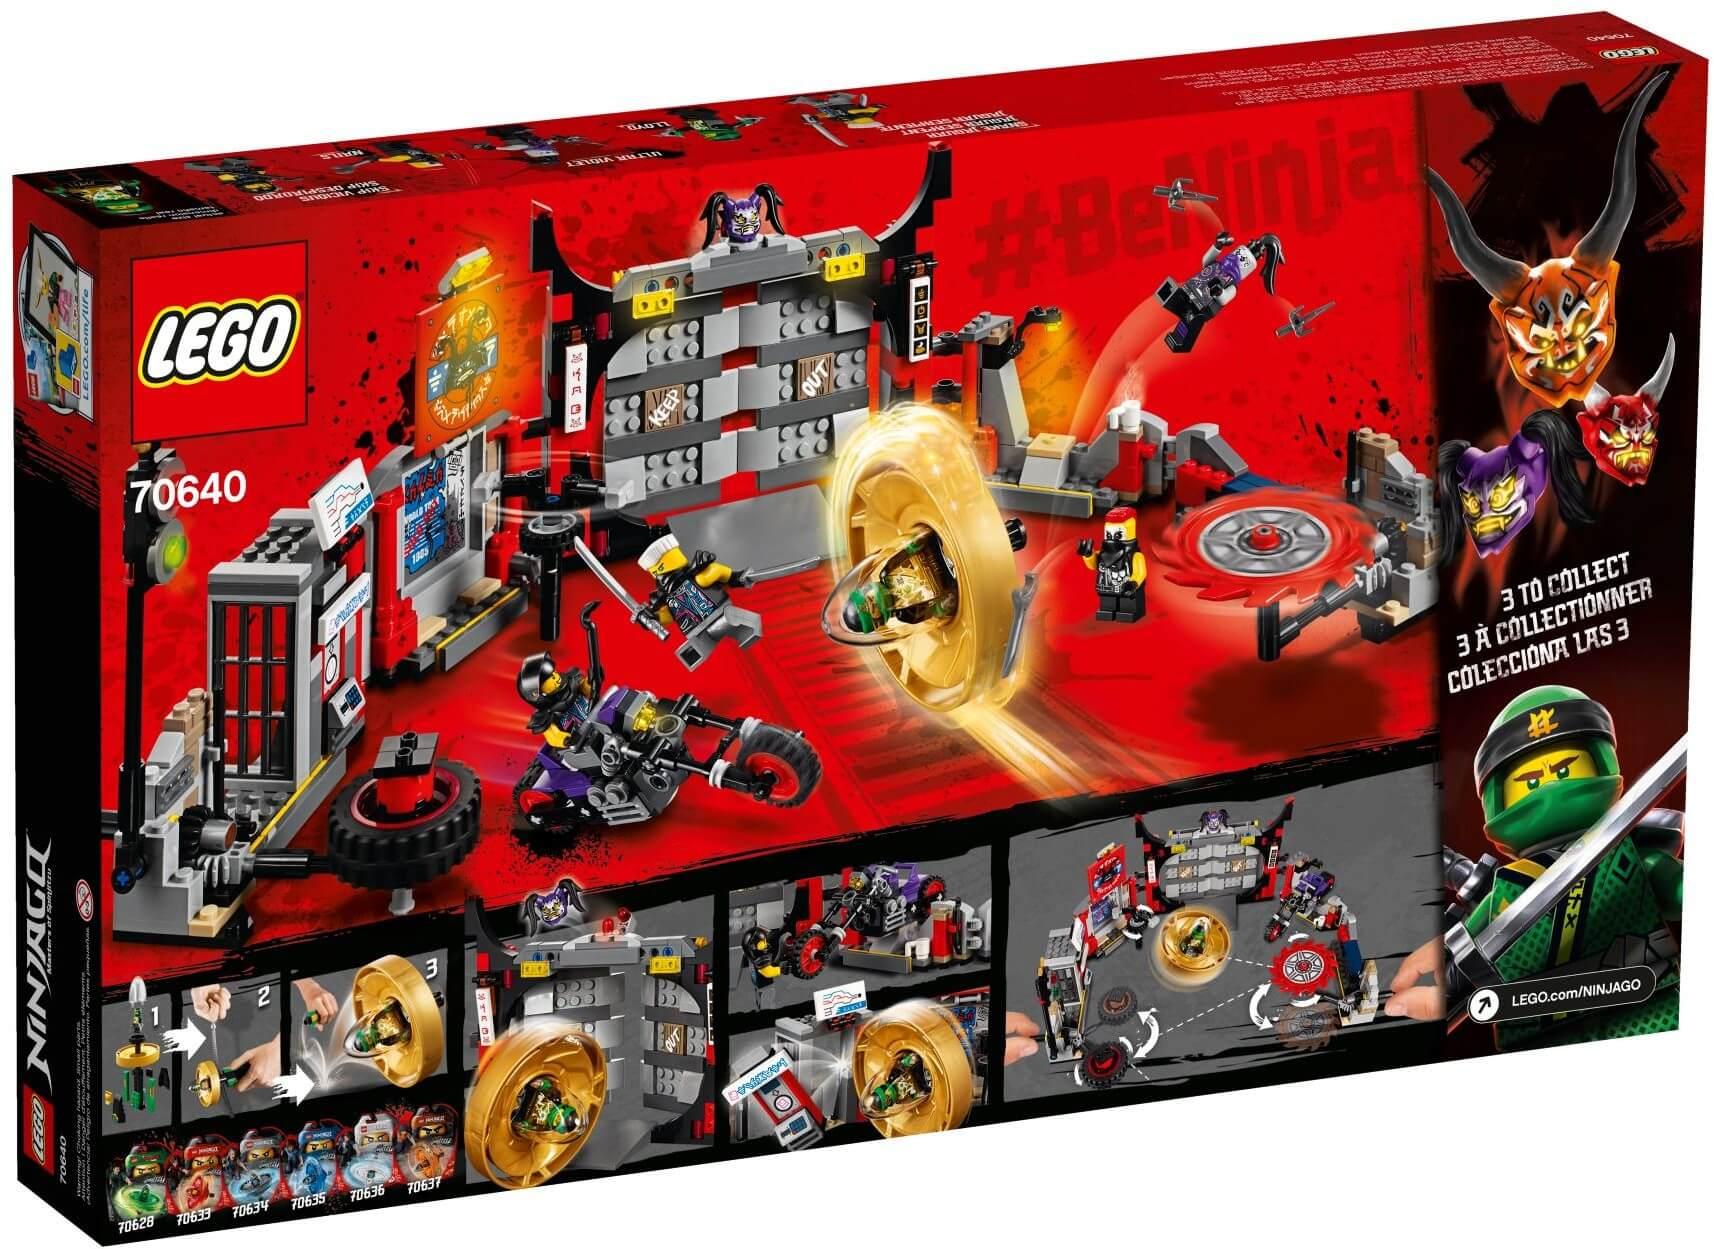 Mua đồ chơi LEGO 70640 - LEGO Ninjago 70640 - Sở Chỉ Huy S.O.G (LEGO Ninjago 70640 S.O.G. Headquarters)